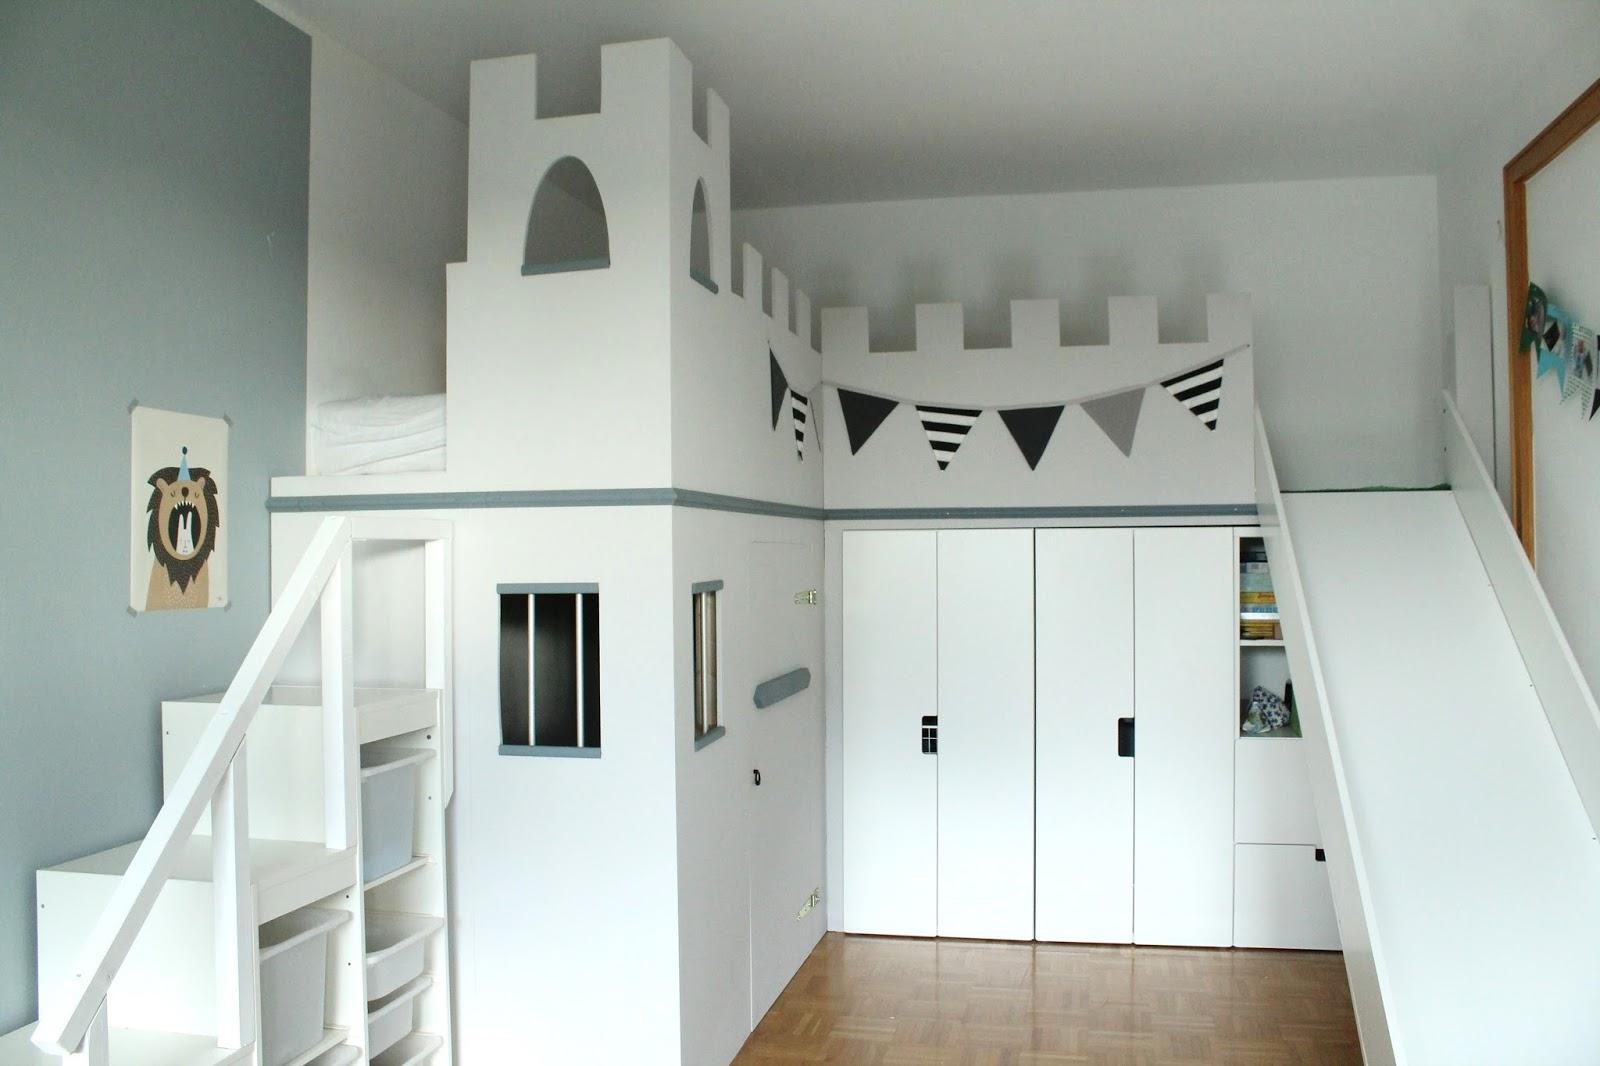 Etagenbett Ikea Kura : Hochbett ritterburg borg castle seng ikea kura girls room